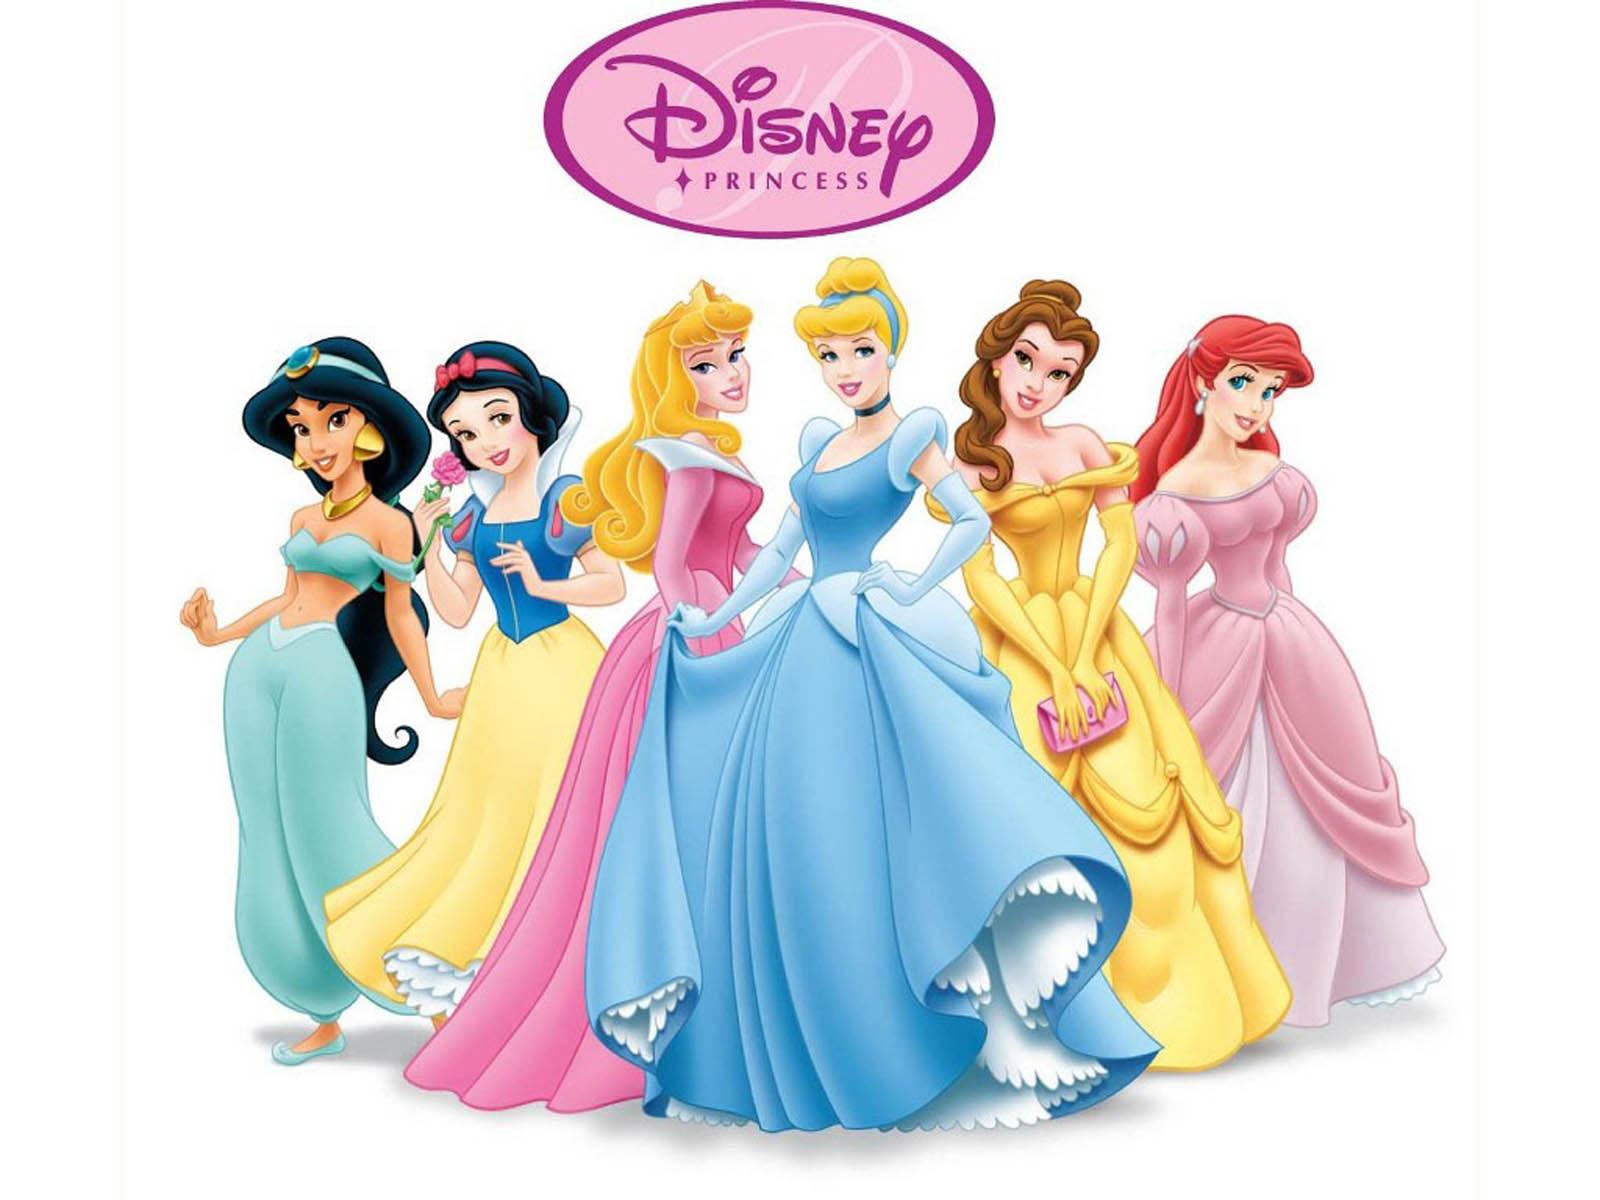 Disney Princess WallpapersImage to Wallpaper 1600x1200